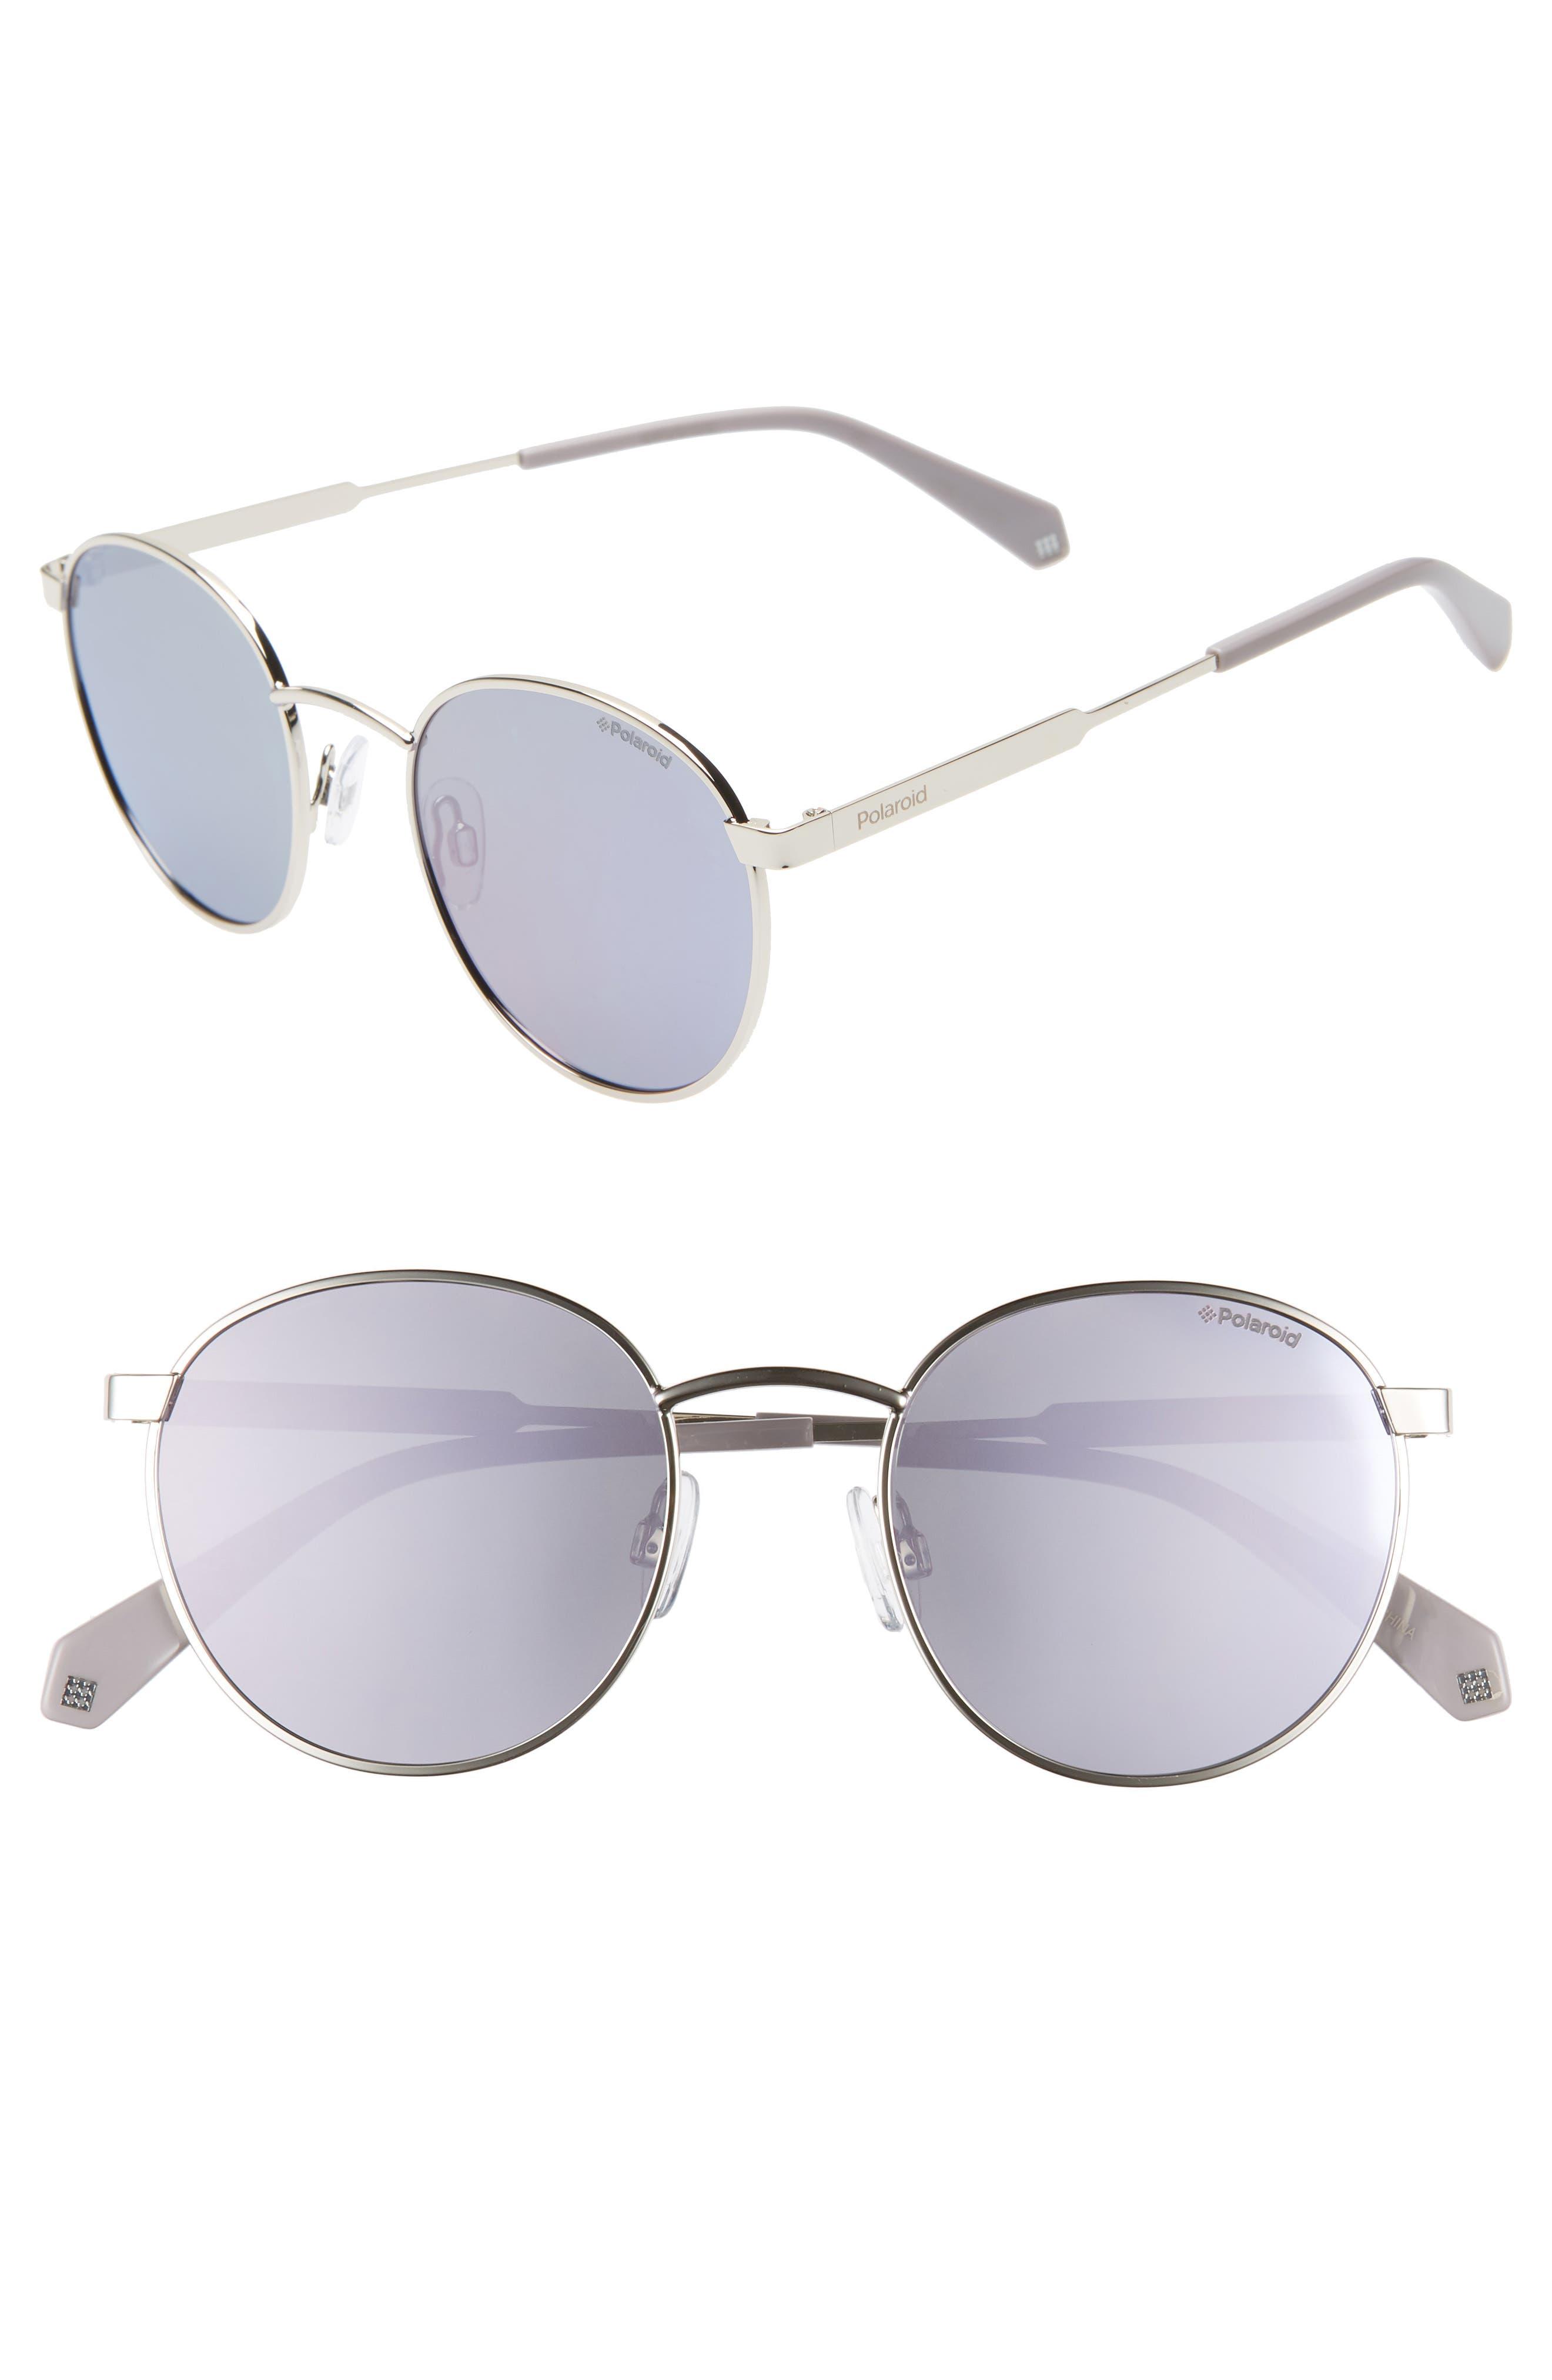 Polaroid 51Mm Polarized Round Sunglasses -